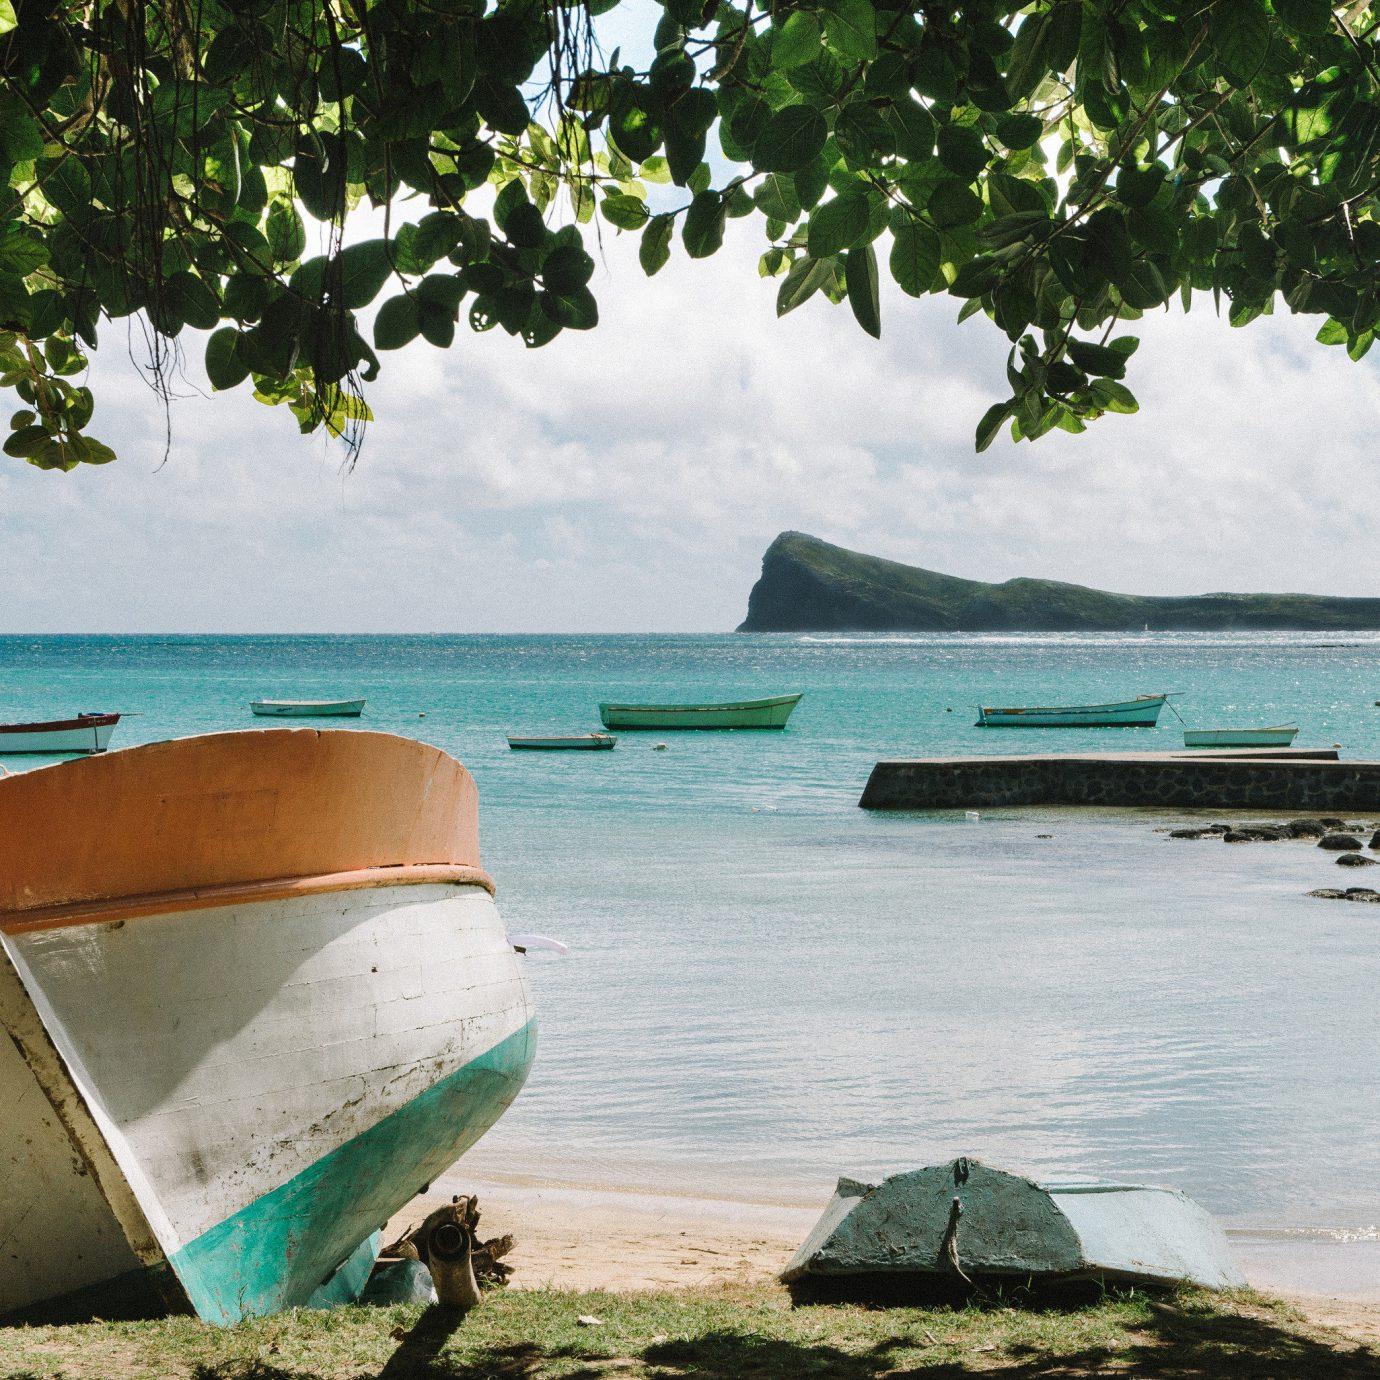 water Sea Boat shore Beach Ocean Coast vehicle tropics Island boating caribbean